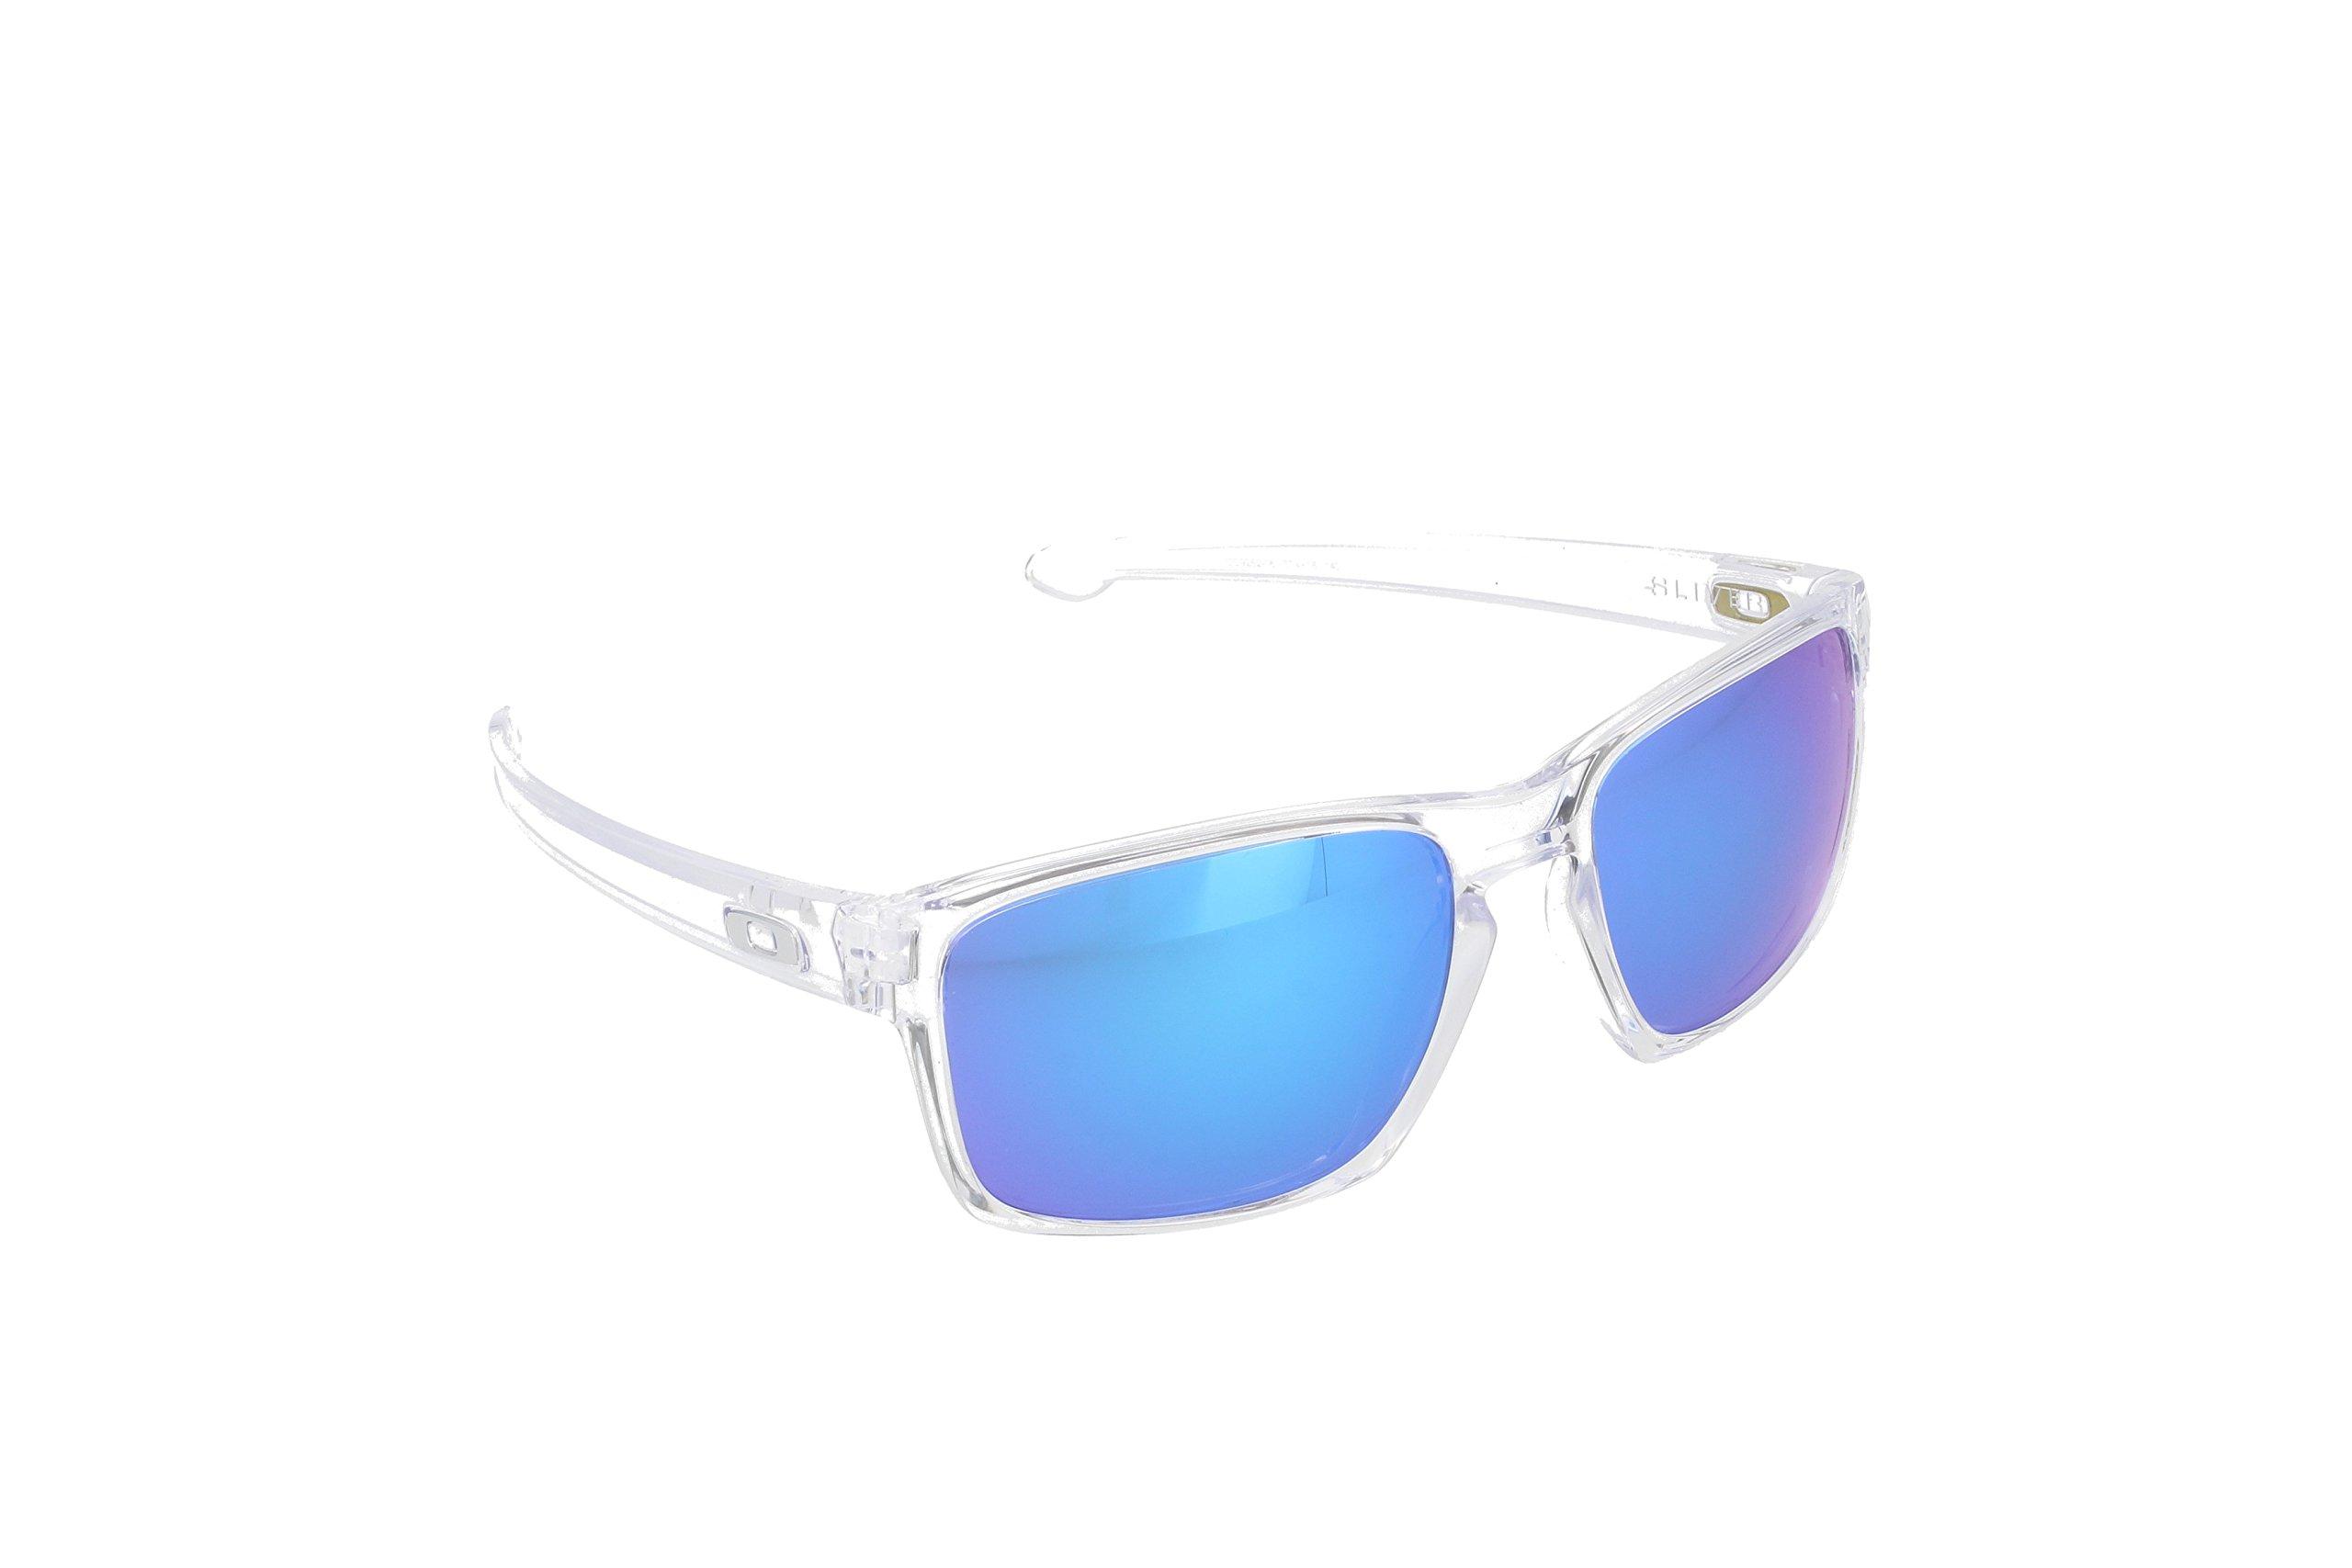 Oakley Men's Sliver OO9262-06 Iridium Rectangular Sunglasses, Polished Clear, 57 mm